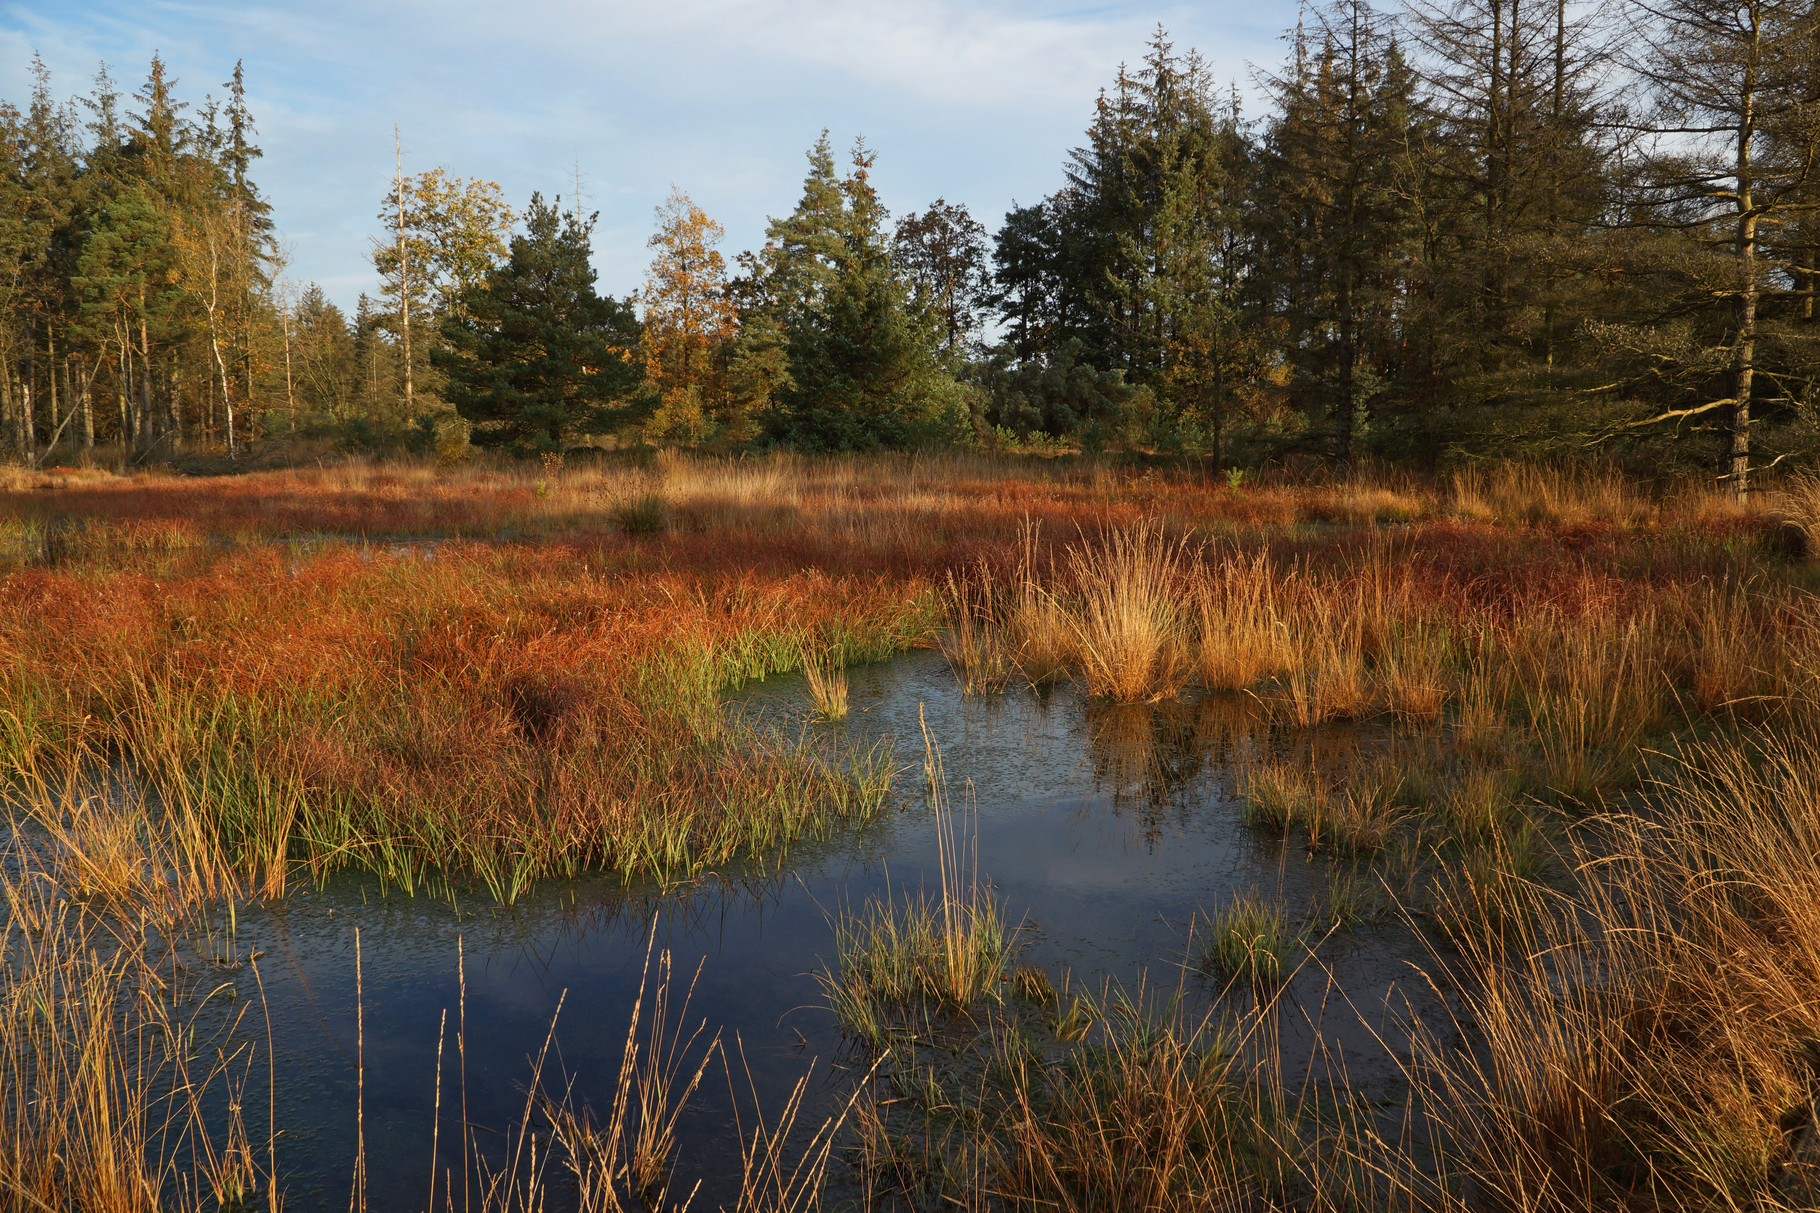 Moor - Bordelumer Heide